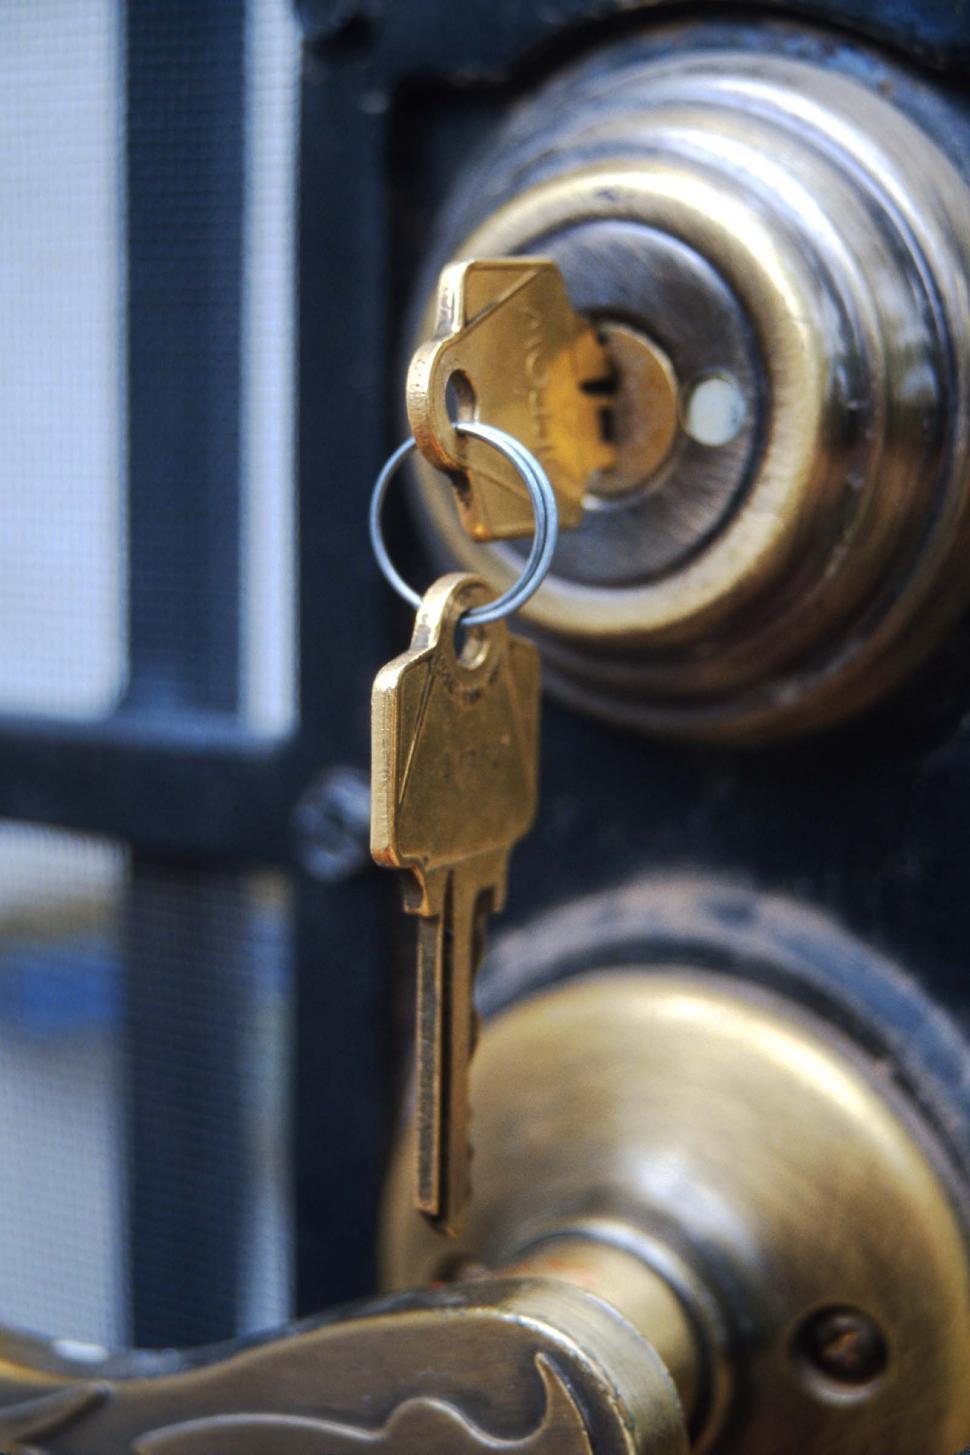 Download Free Stock HD Photo of Keys hang from deadbolt lock Online